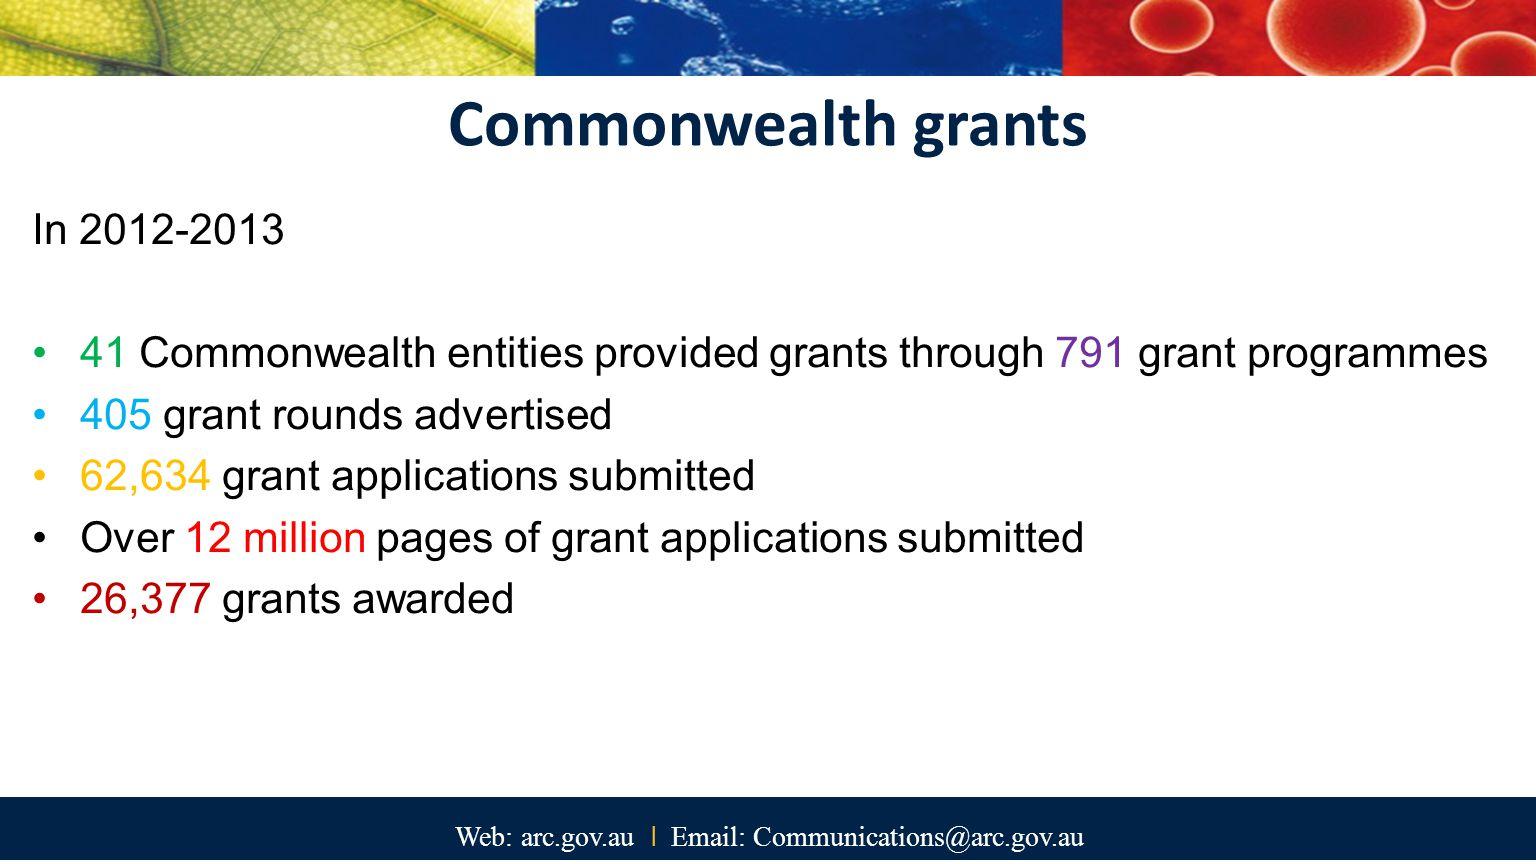 Web: arc.gov.au I Email: Communications@arc.gov.au NCGP stats 2014 7000 proposals 22,000 assessments 1300 new grants 8000 active grants 1600 post award requests